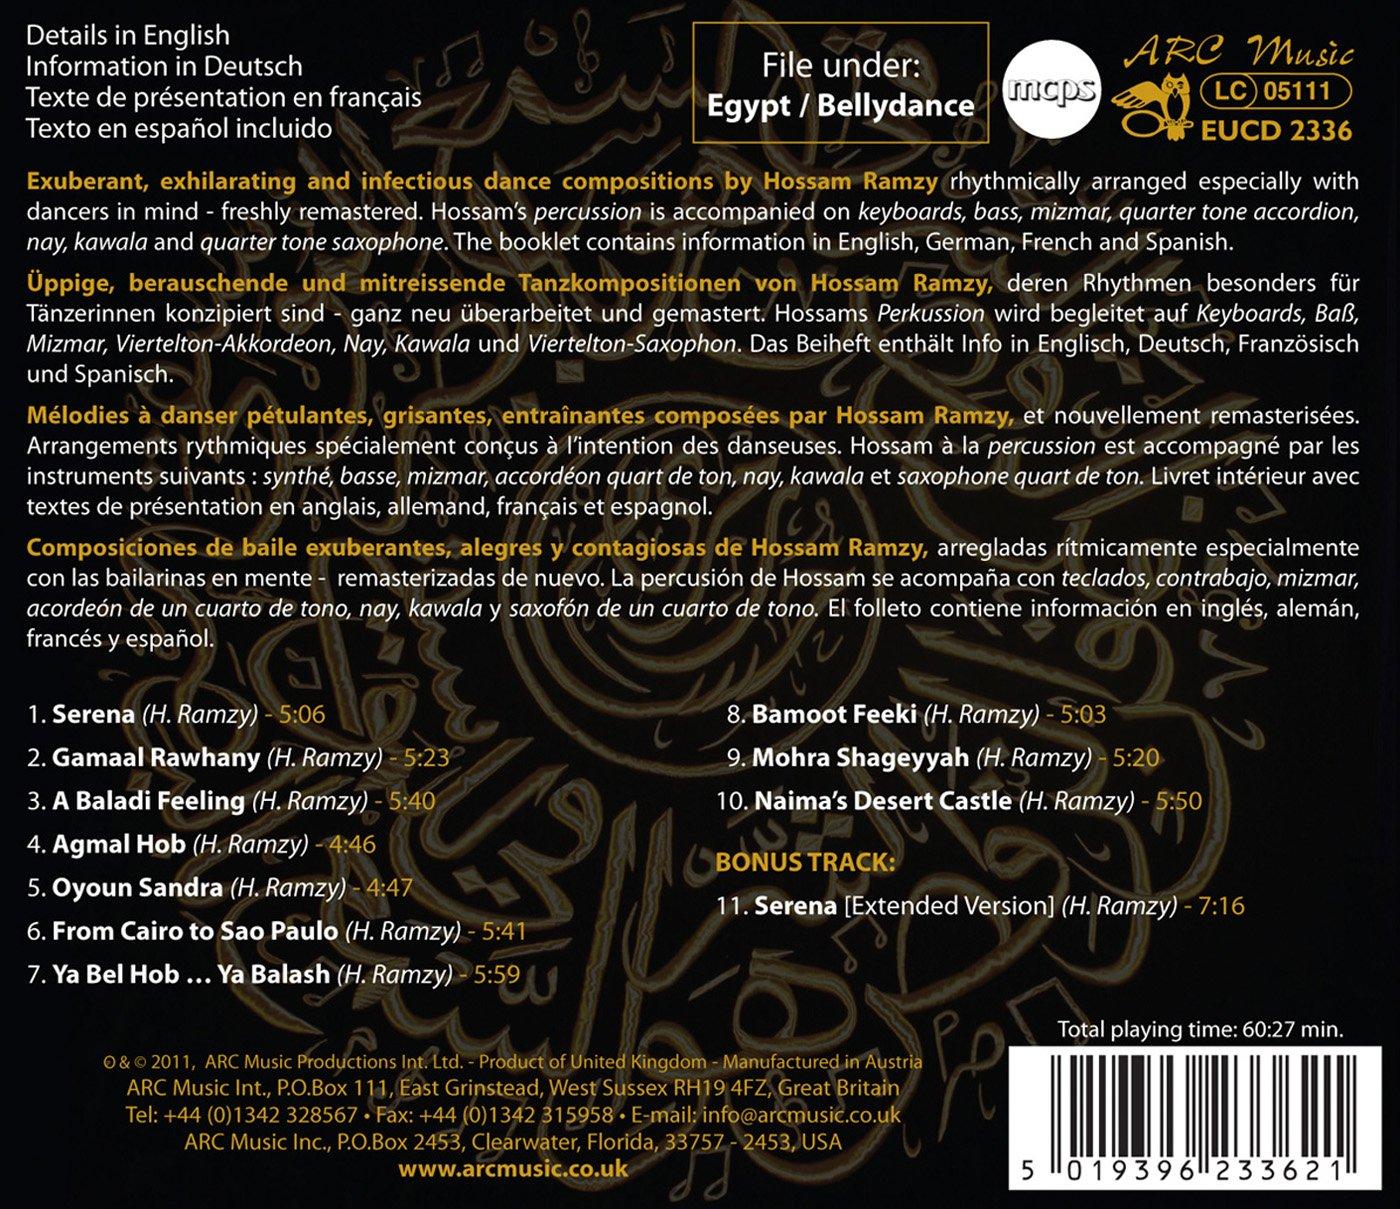 HOSSAM RAMZY - Bellydance Greats - from Cairo to Sao Paulo - Amazon.com Music